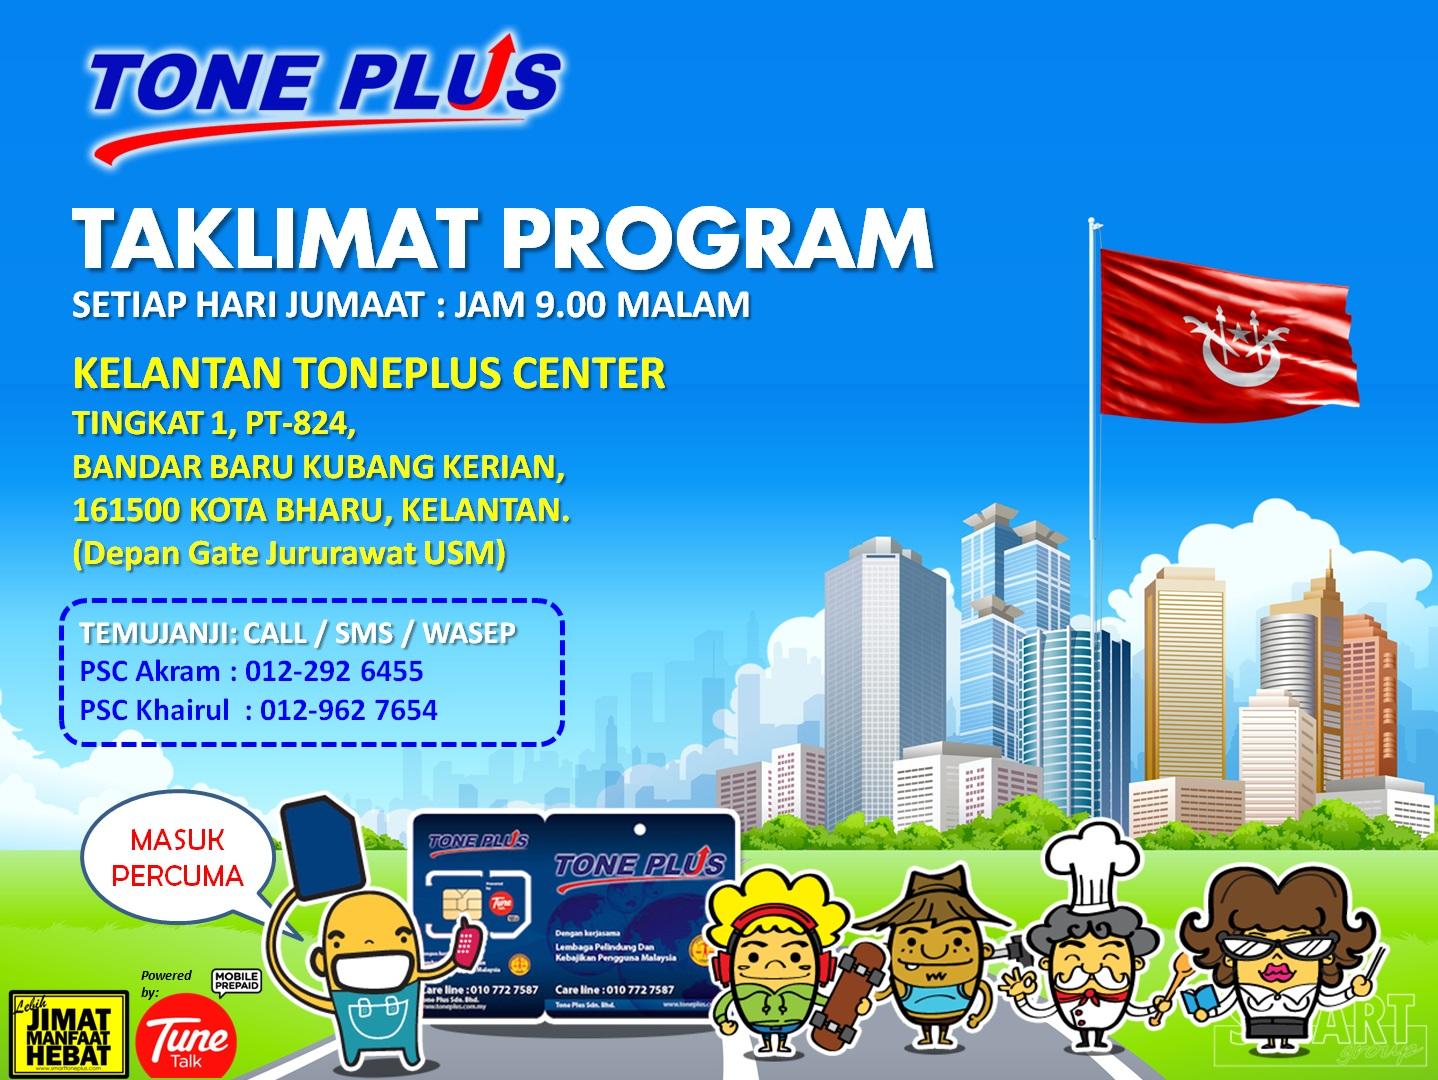 Tone Plus Preview Kelantan